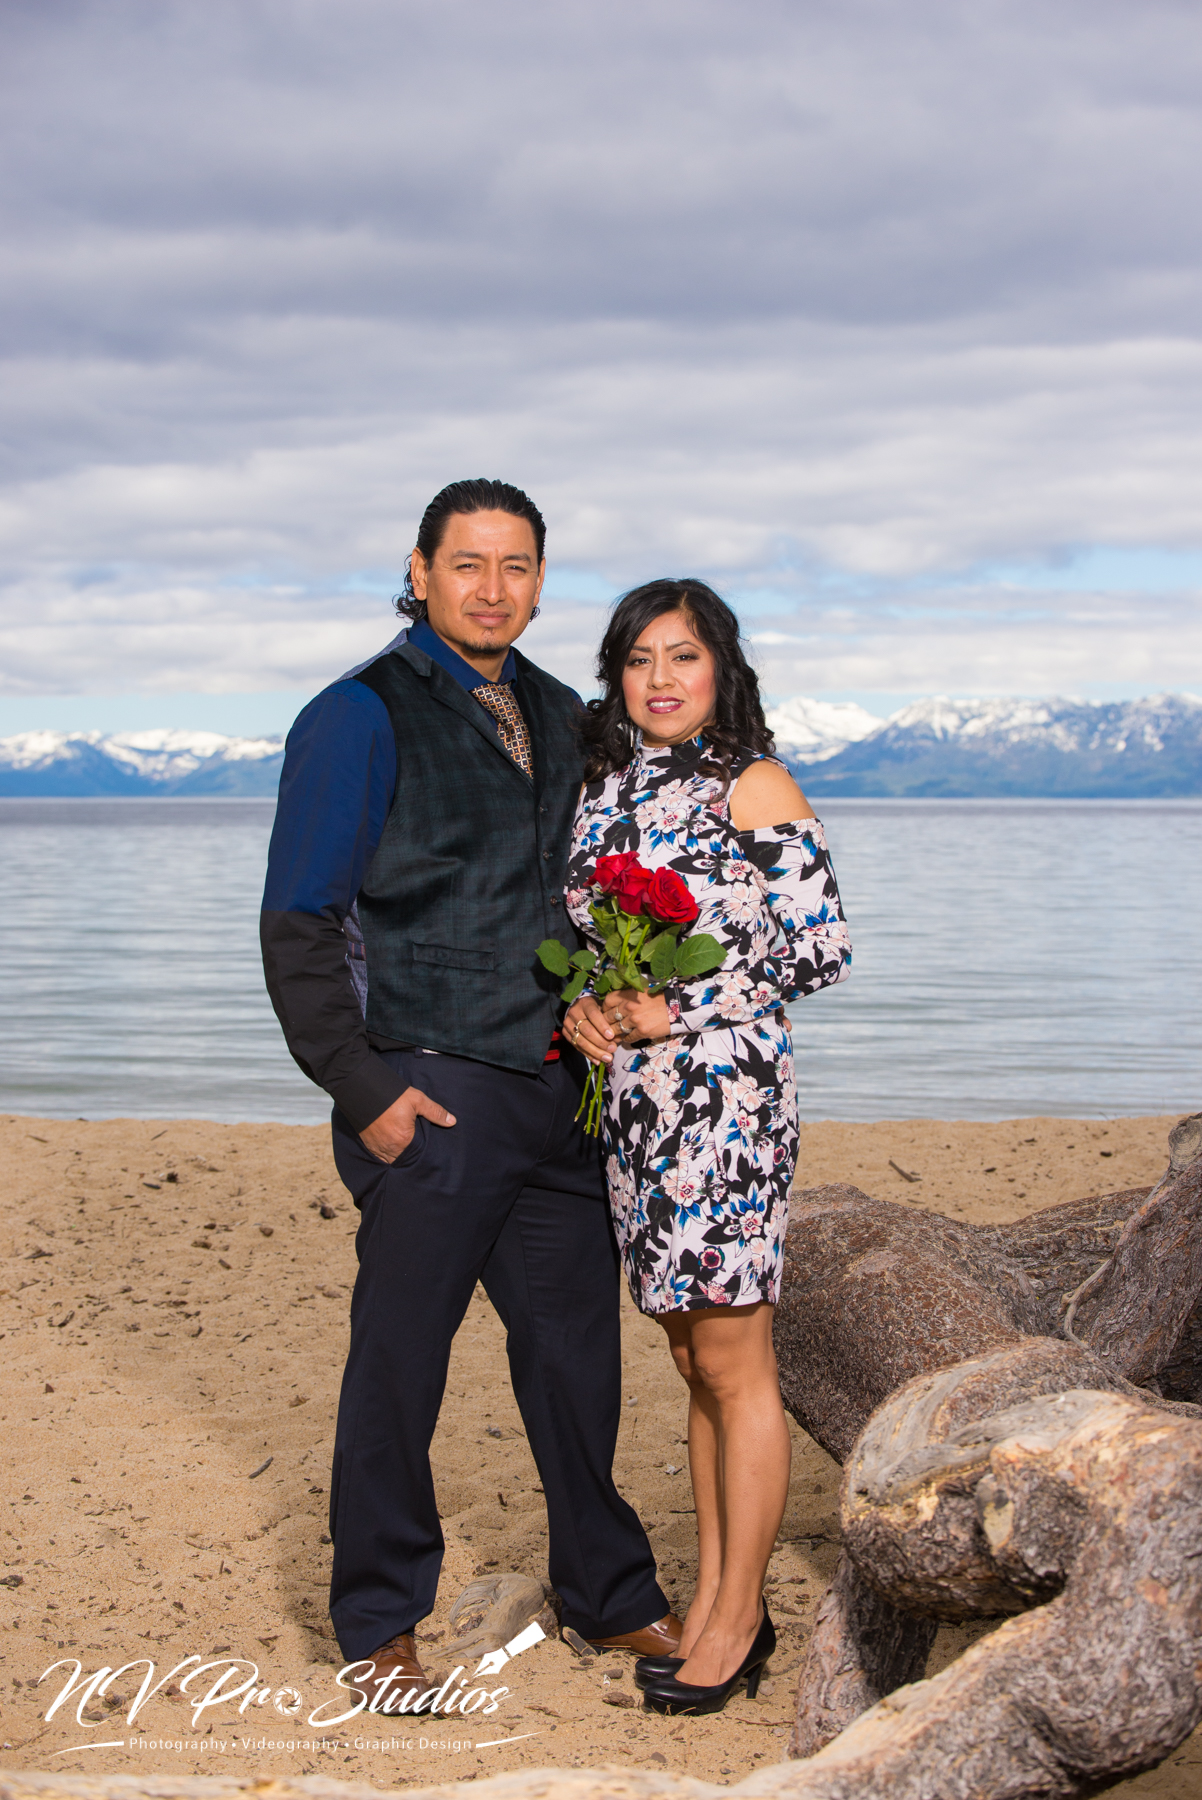 J & D - Tahoe Photography.jpg